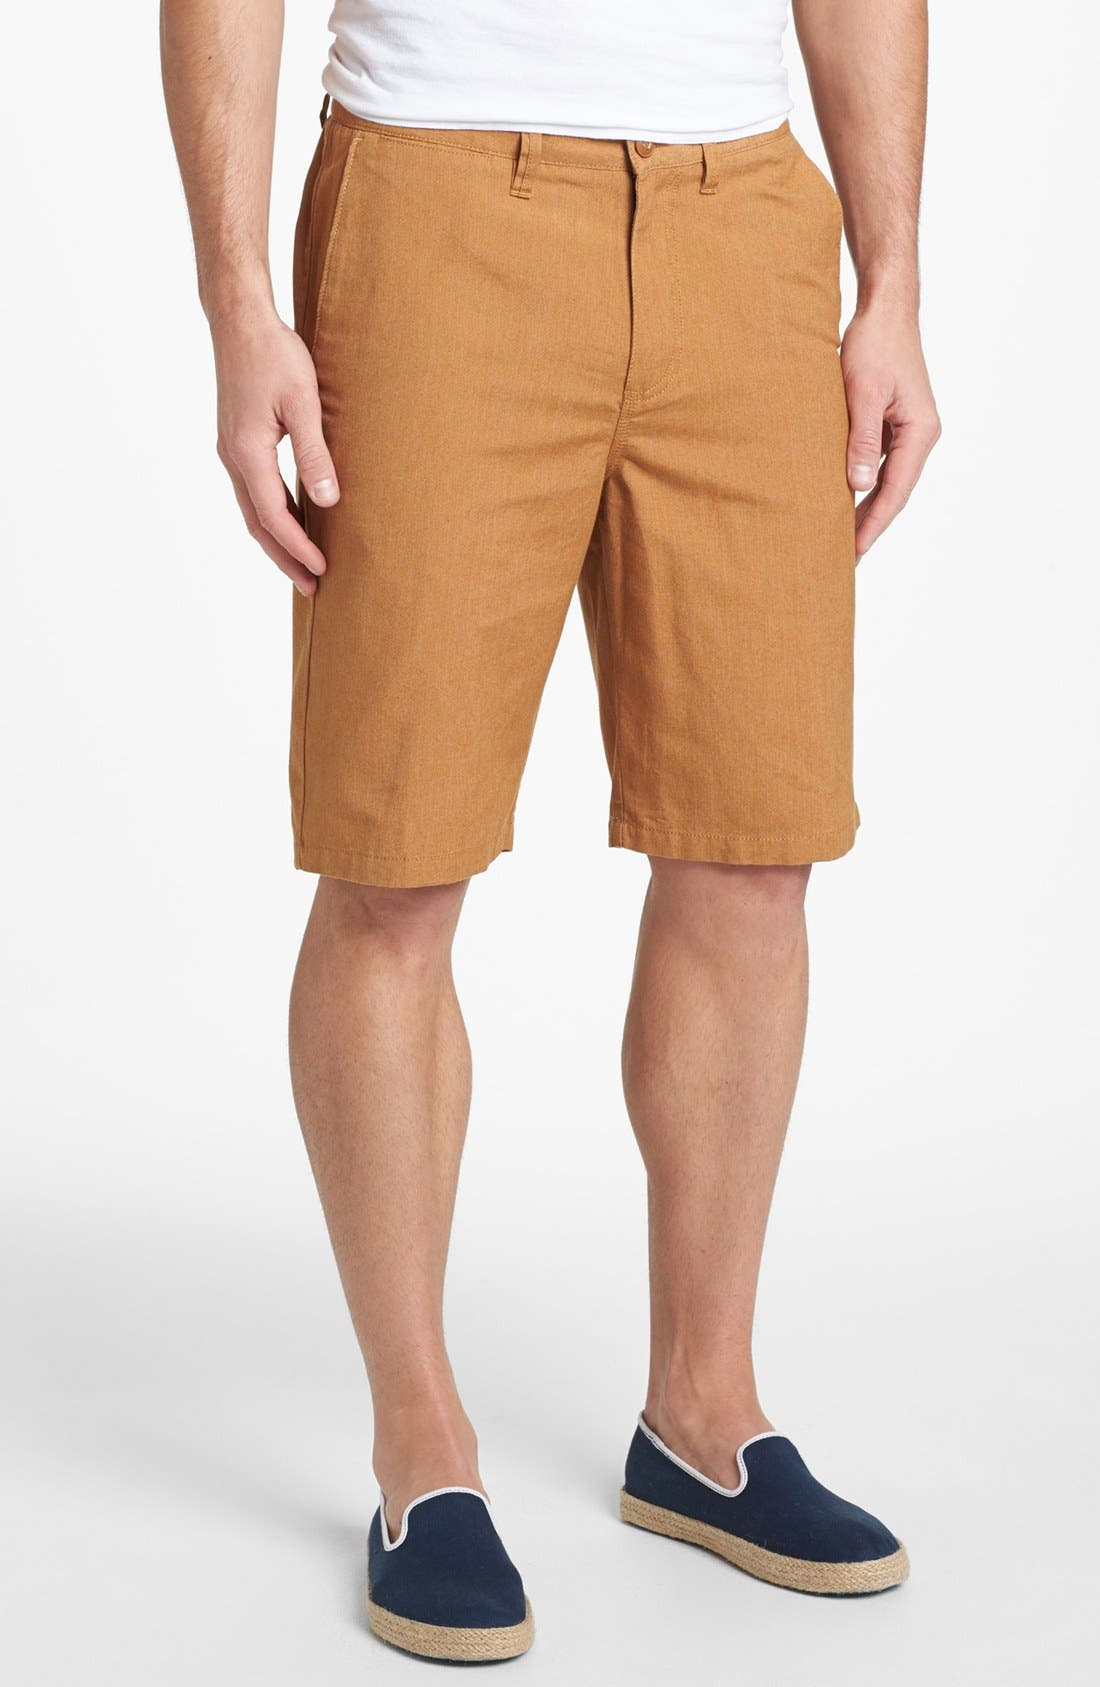 Main Image - Vans 'Dewitt' Shorts